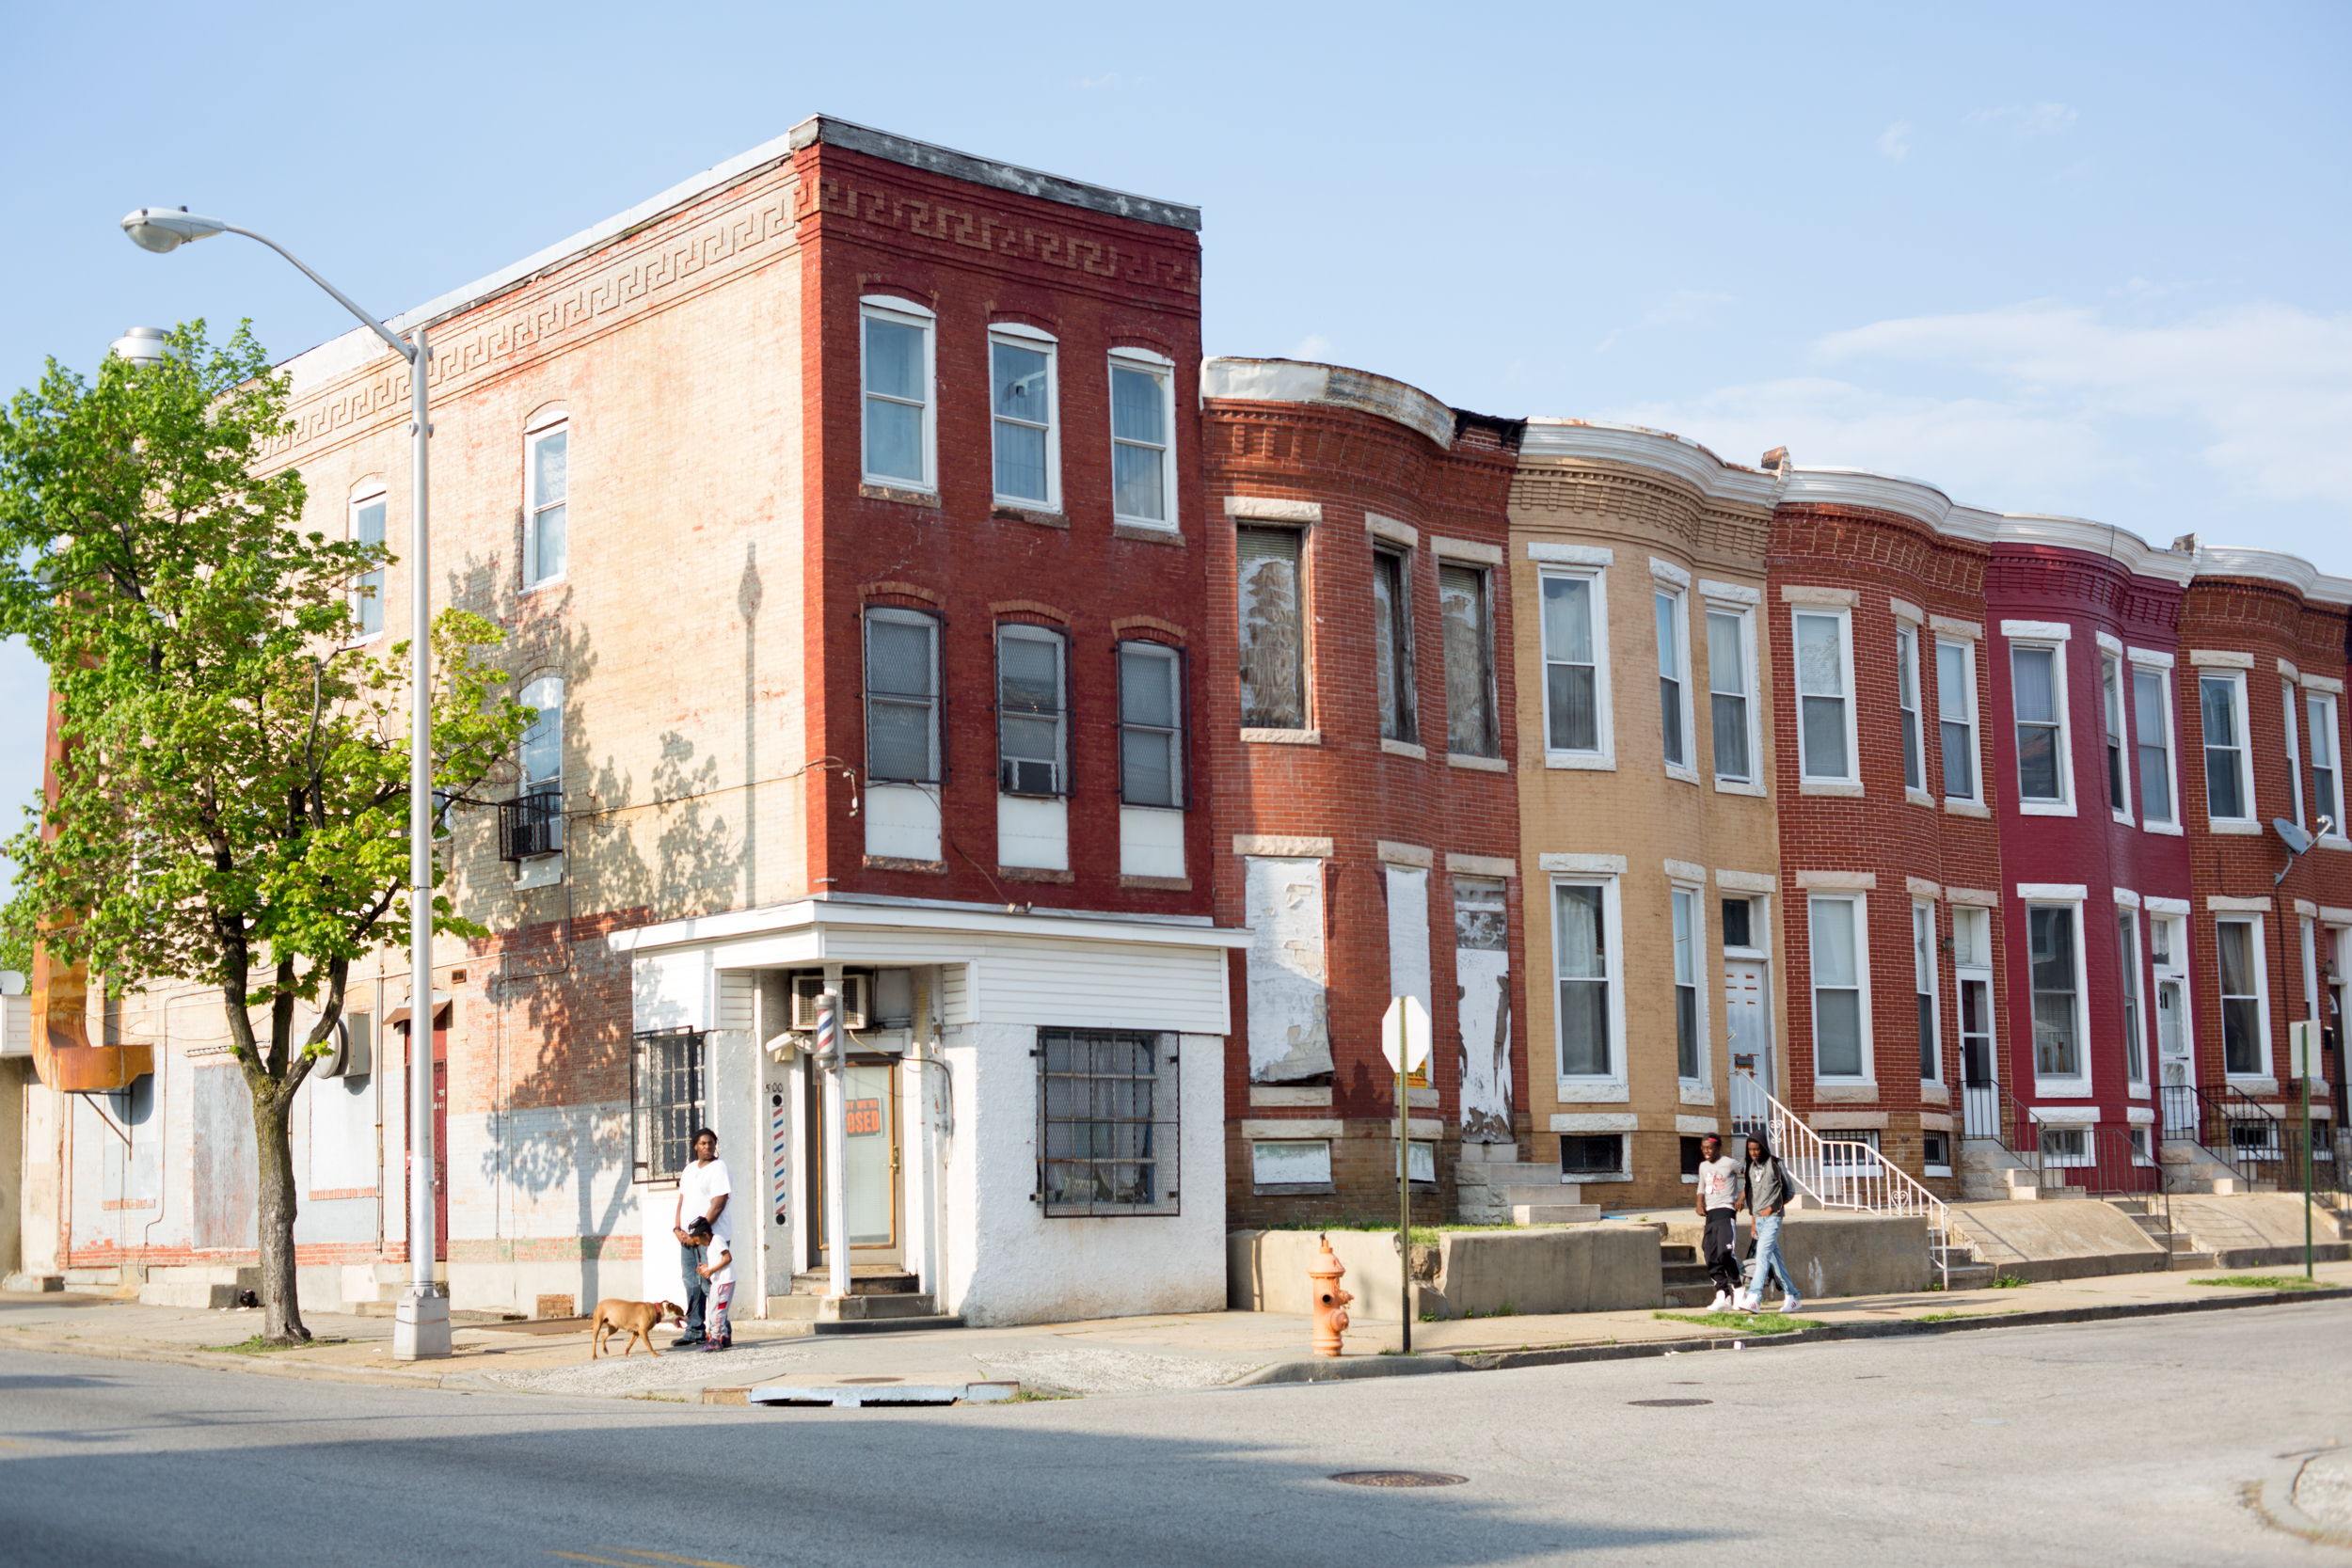 A Baltimore street corner. Baltimore, Maryland, May 3rd, 2015